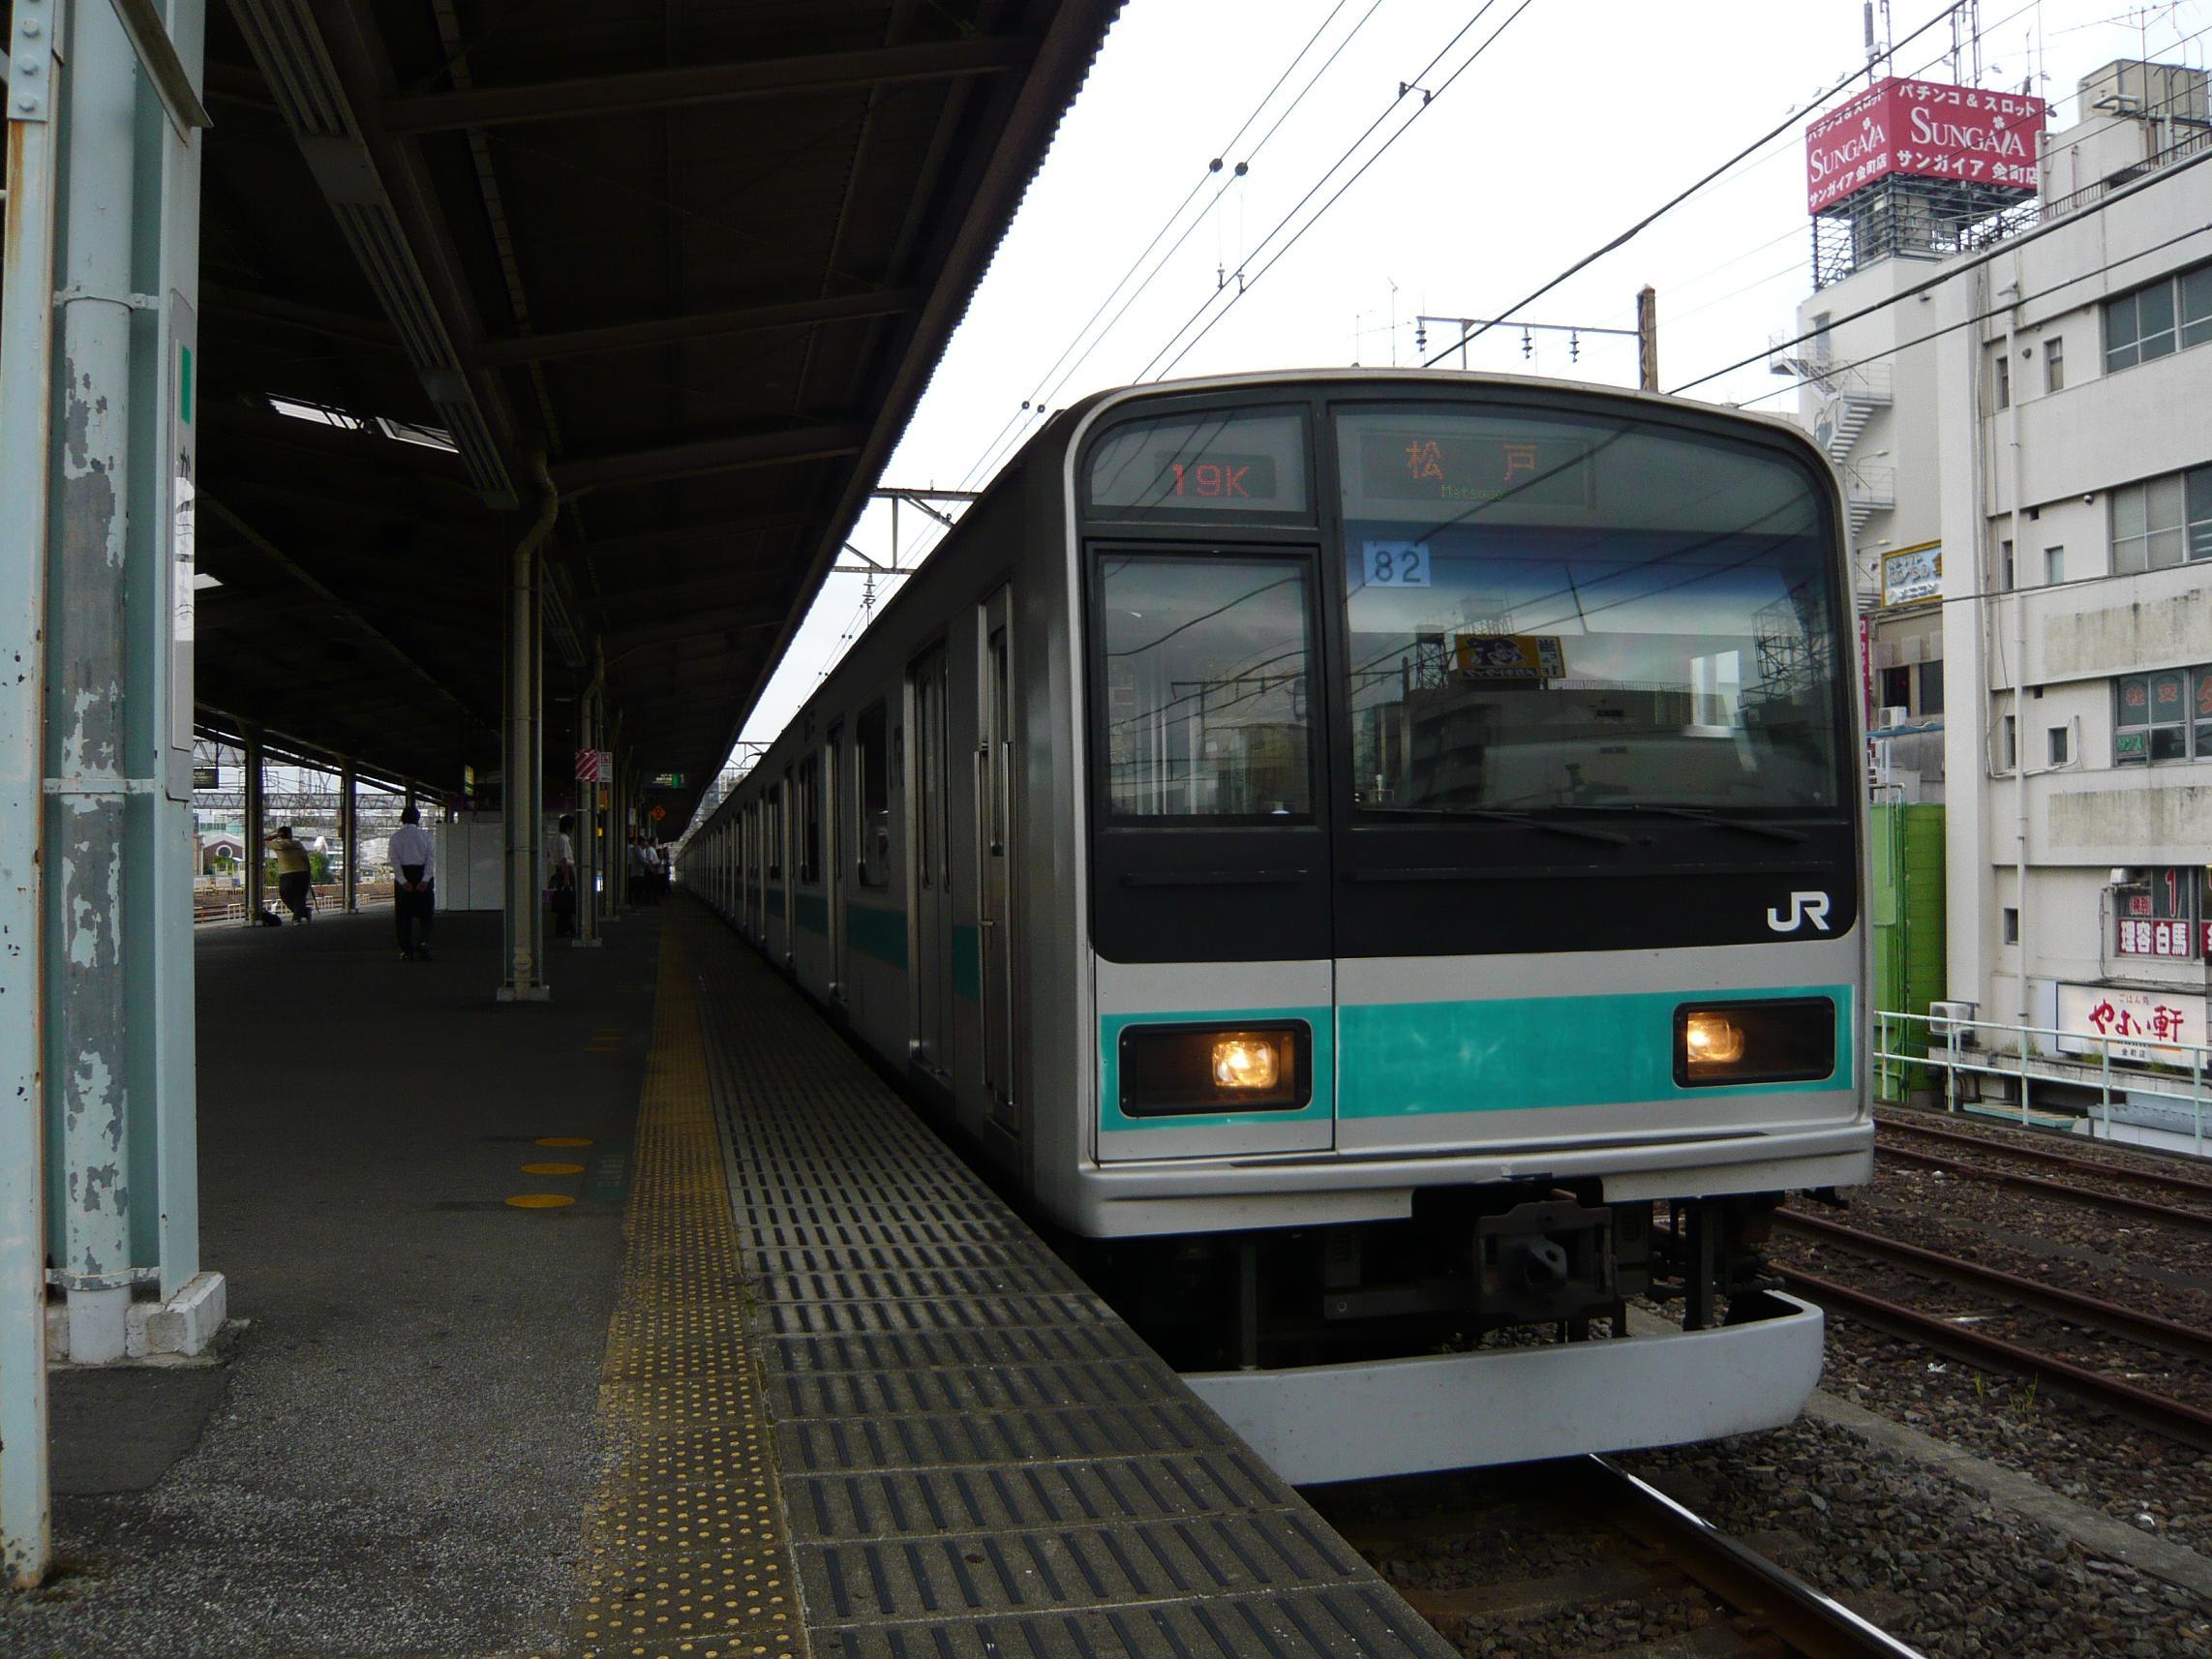 P1010690-2.JPG